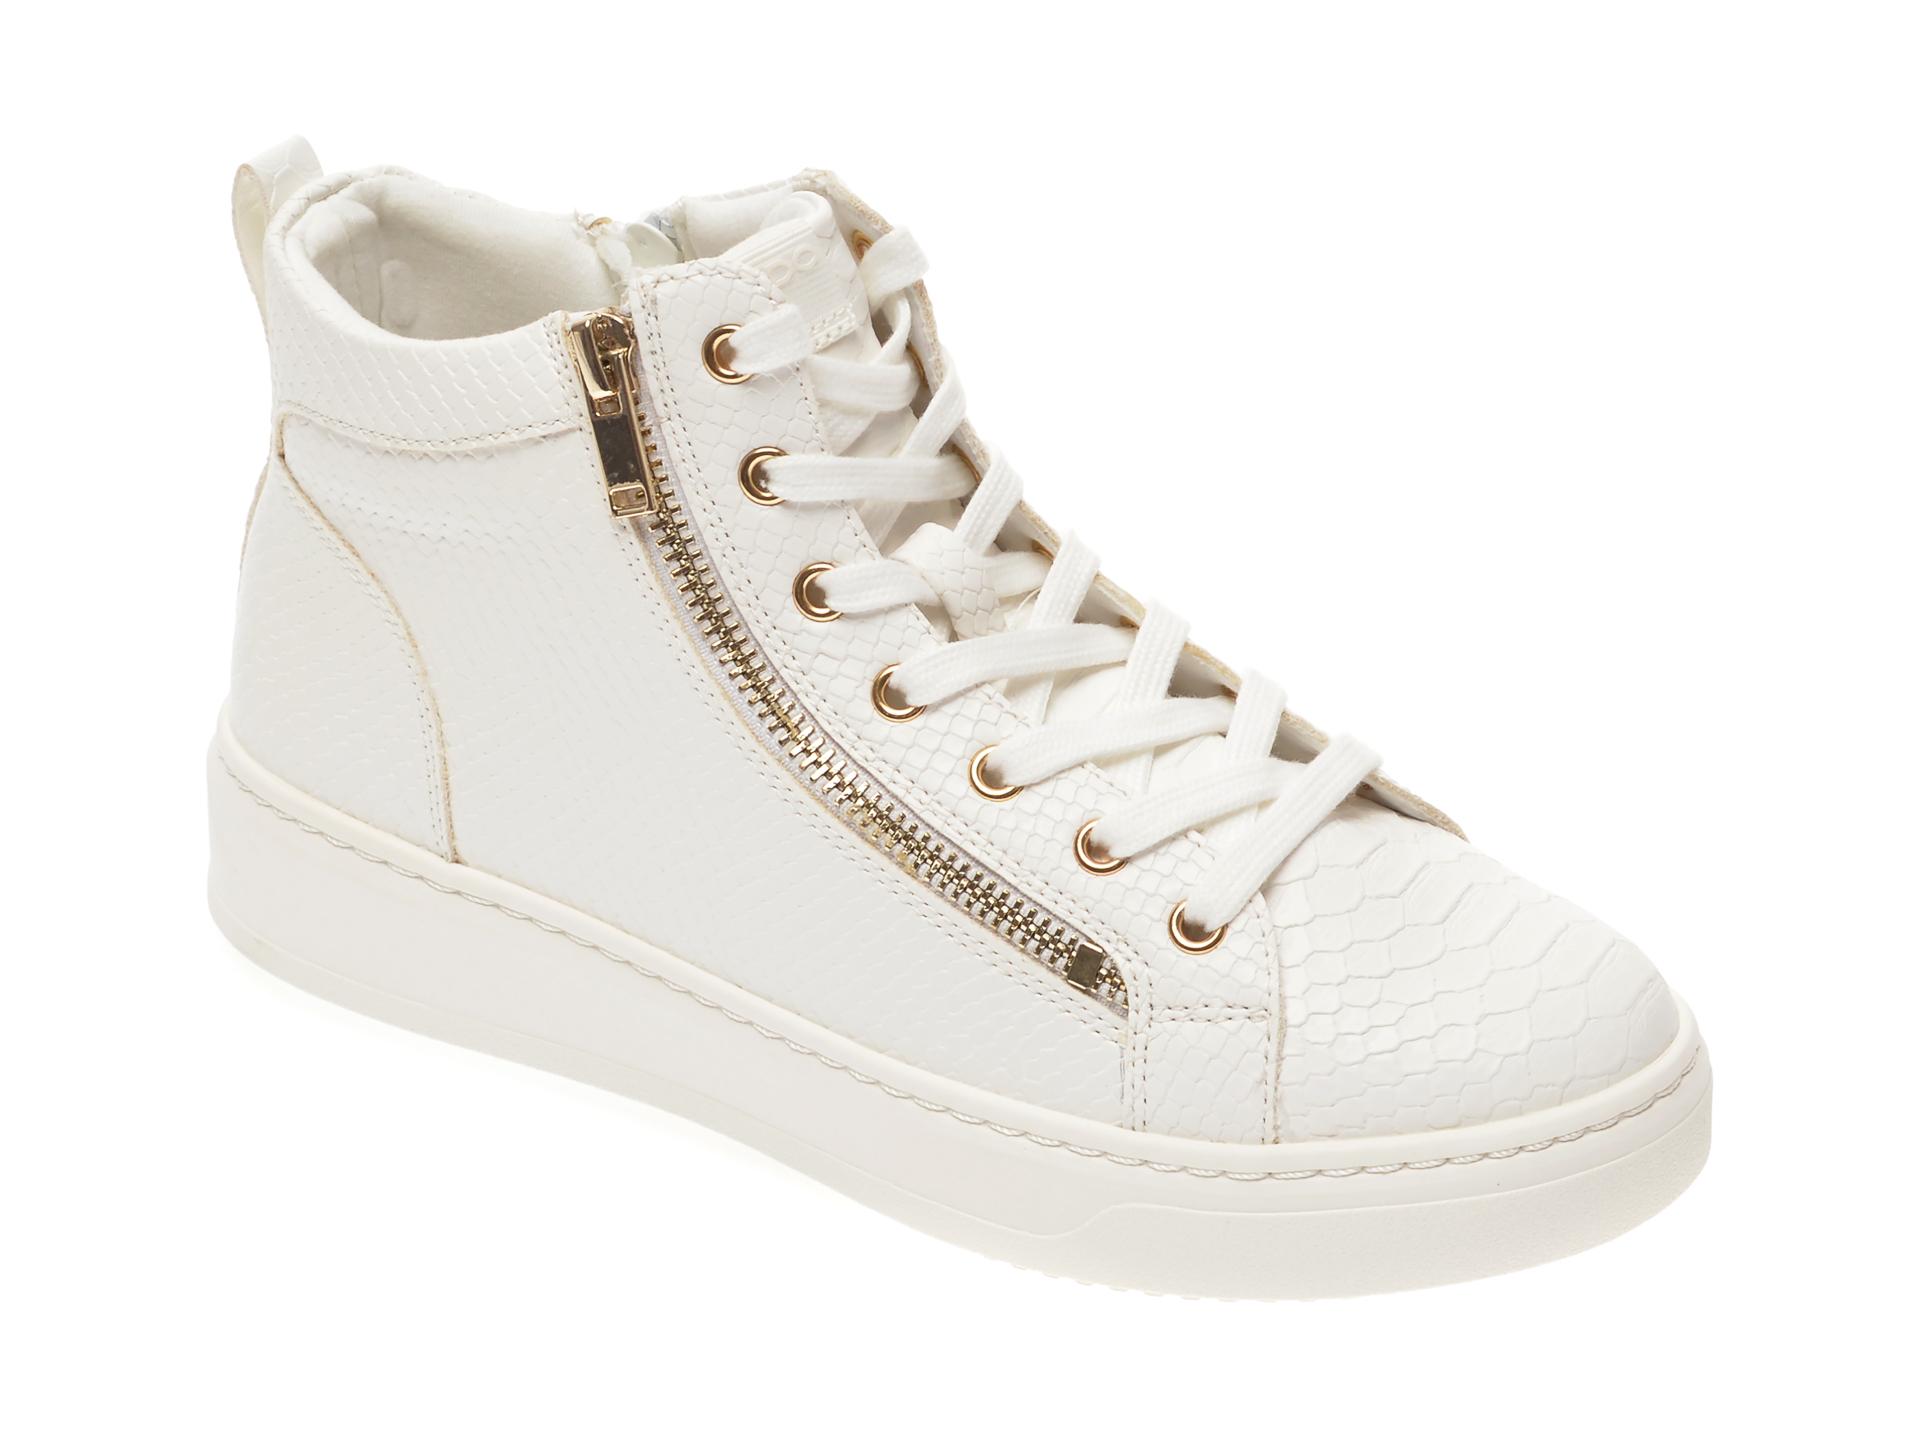 Pantofi sport ALDO albi, Harleigh100, din piele ecologica